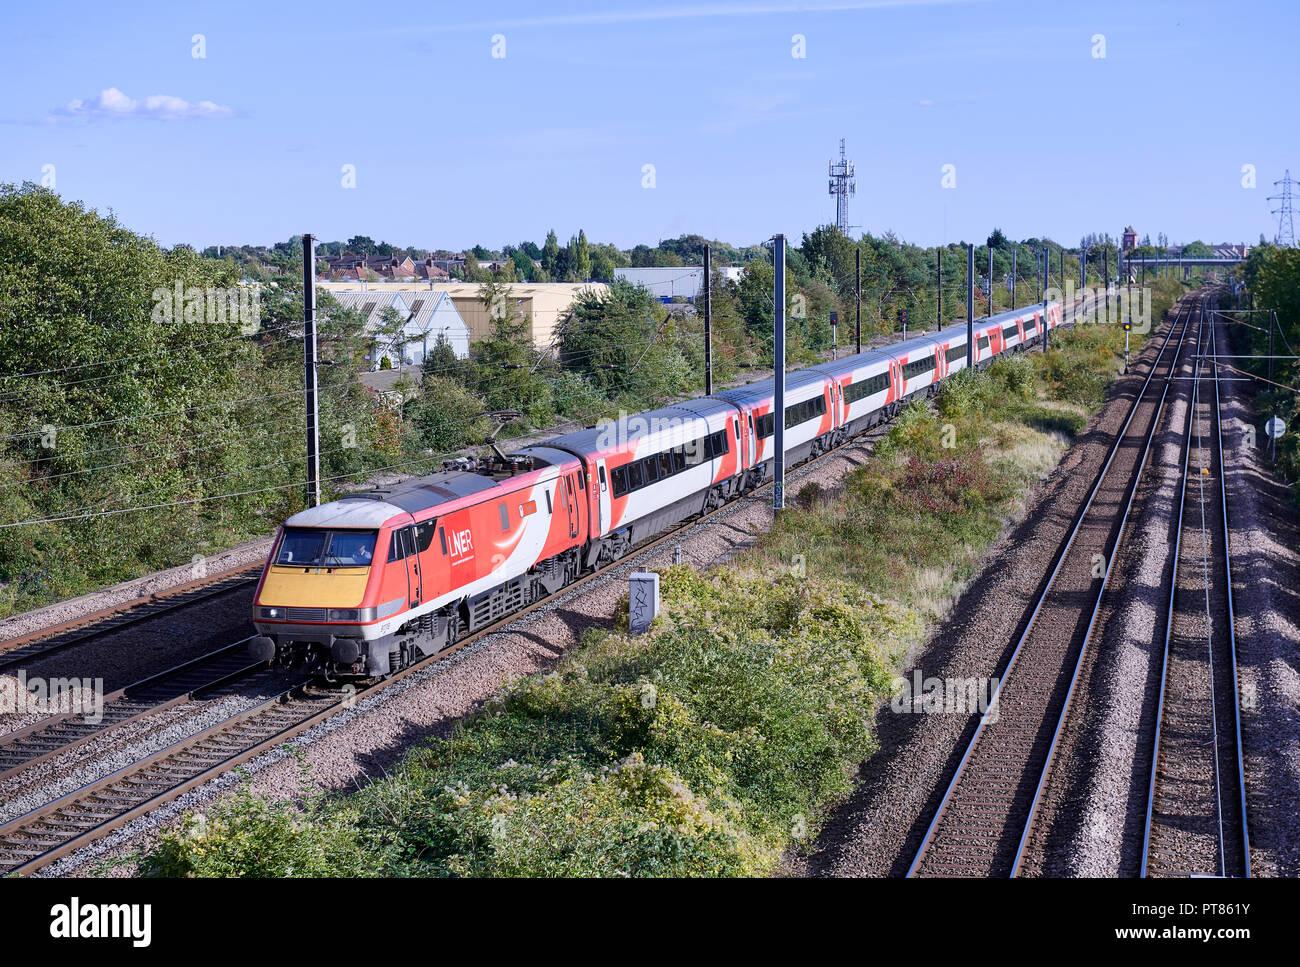 LNER Class 91 91118 heads 1S19 1330 London Kings Cross to Edinburgh service through Werrington Junction on the East Coast Mainline on 24/09/18. - Stock Image